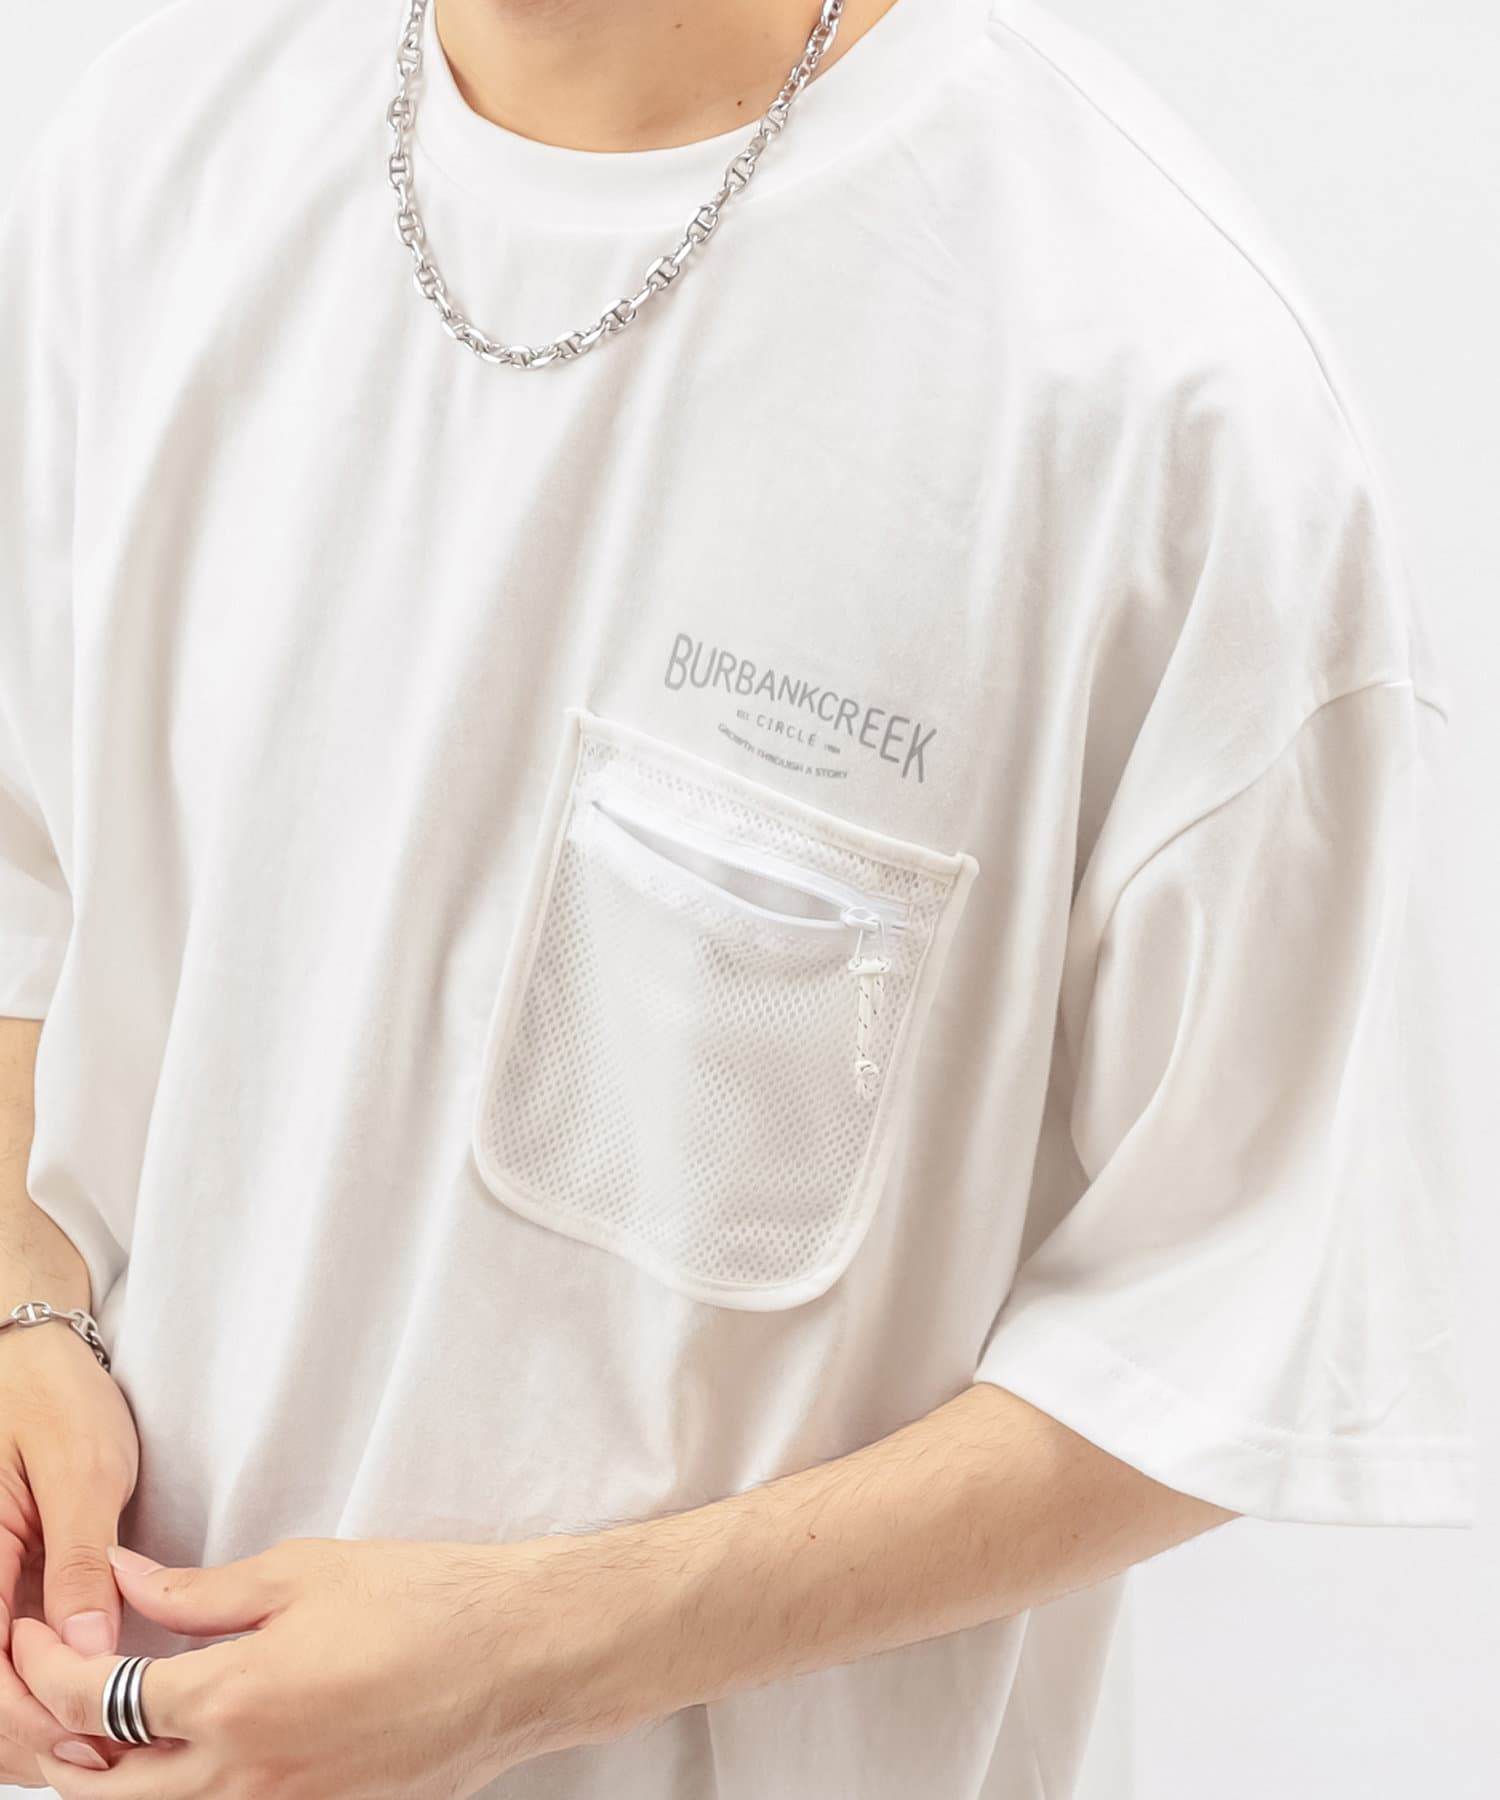 Discoat(ディスコート) メンズ 【BURBANKCREEK】ポケットメッシュTシャツ ホワイト